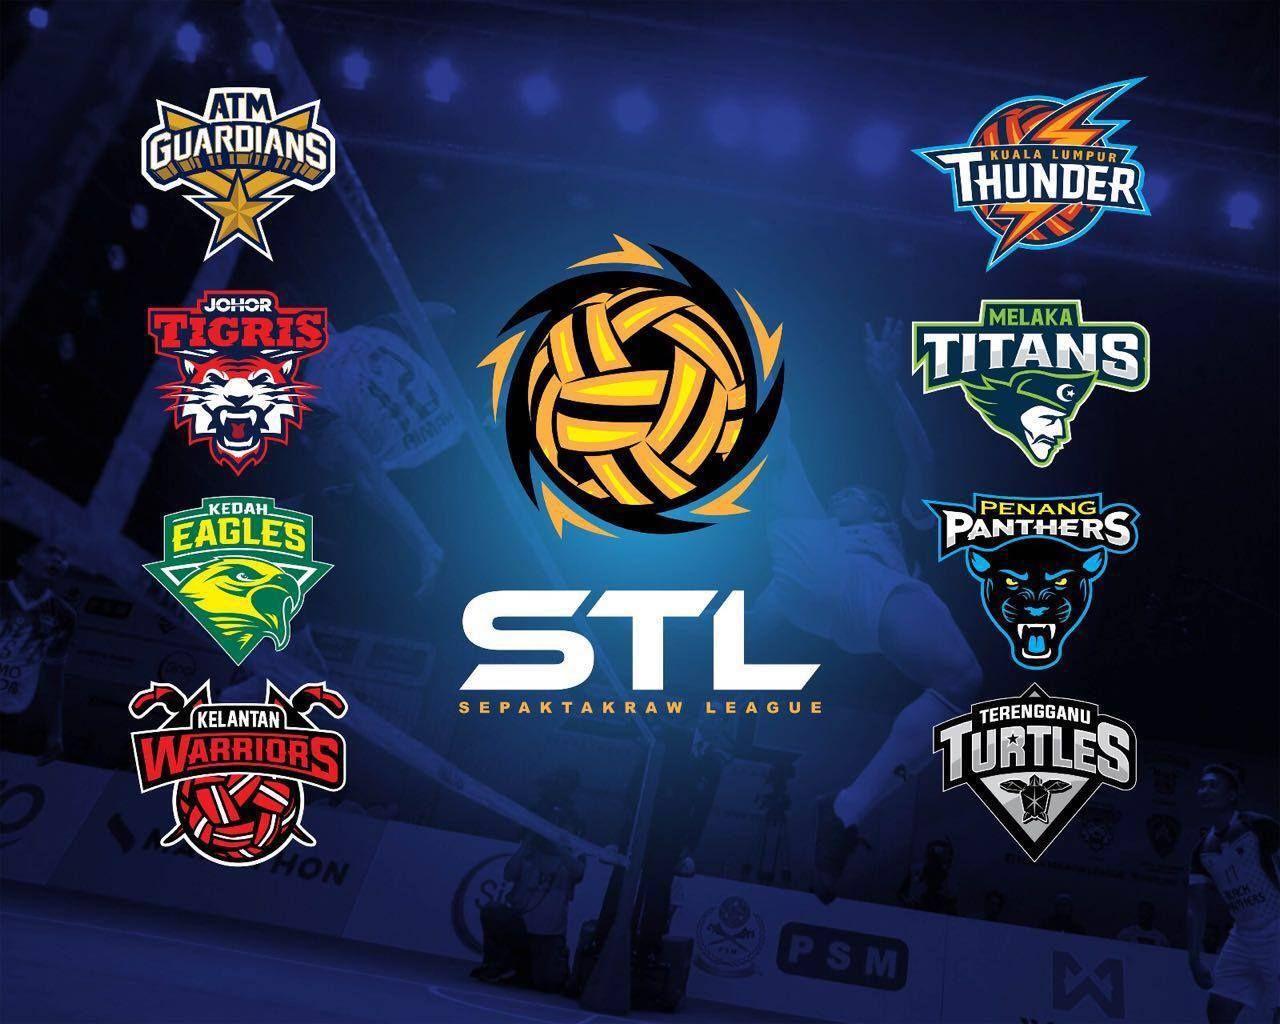 Sepak Takraw Team Logo Sports logo, Team logo, Sports decals